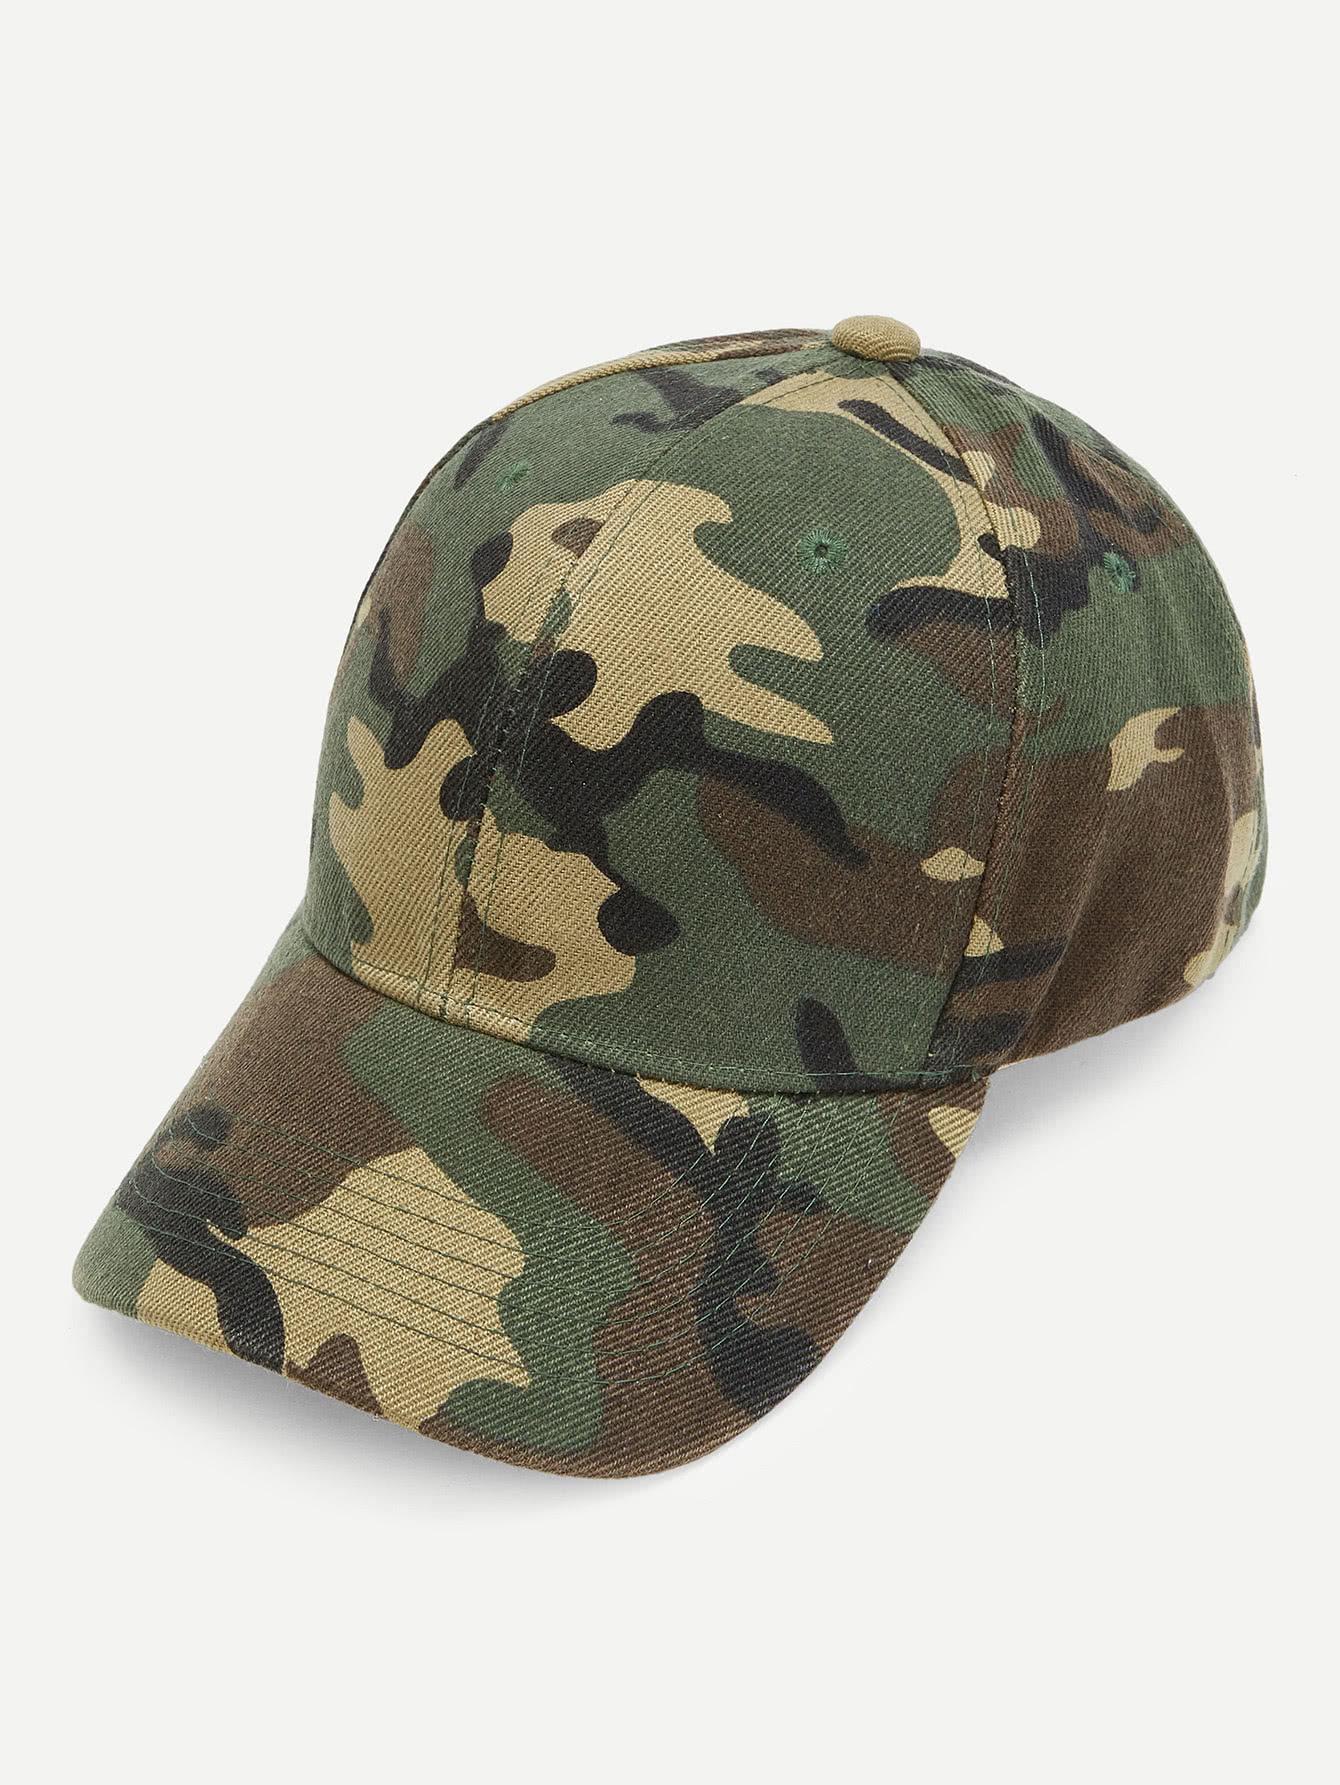 Camouflage Baseball Cap jungle new outdoor men s recreational fishing hunting baseball cap bionic camouflage